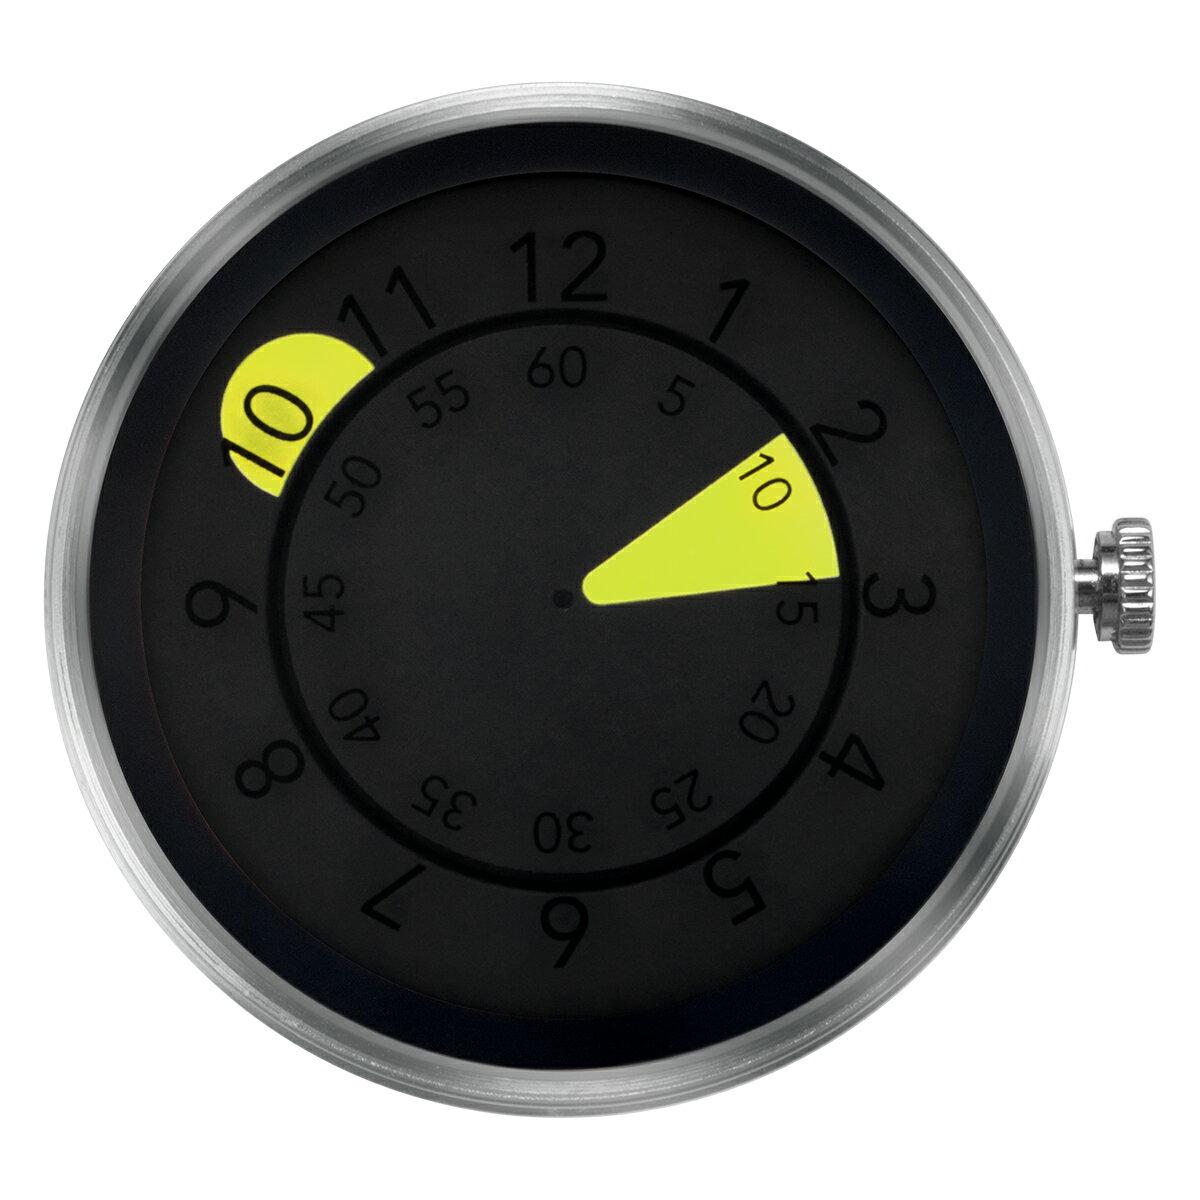 ZEROO 交換用ベゼル ZEROO AQUA DROP ゼロ 電池式クォーツ 腕時計 [M10040]